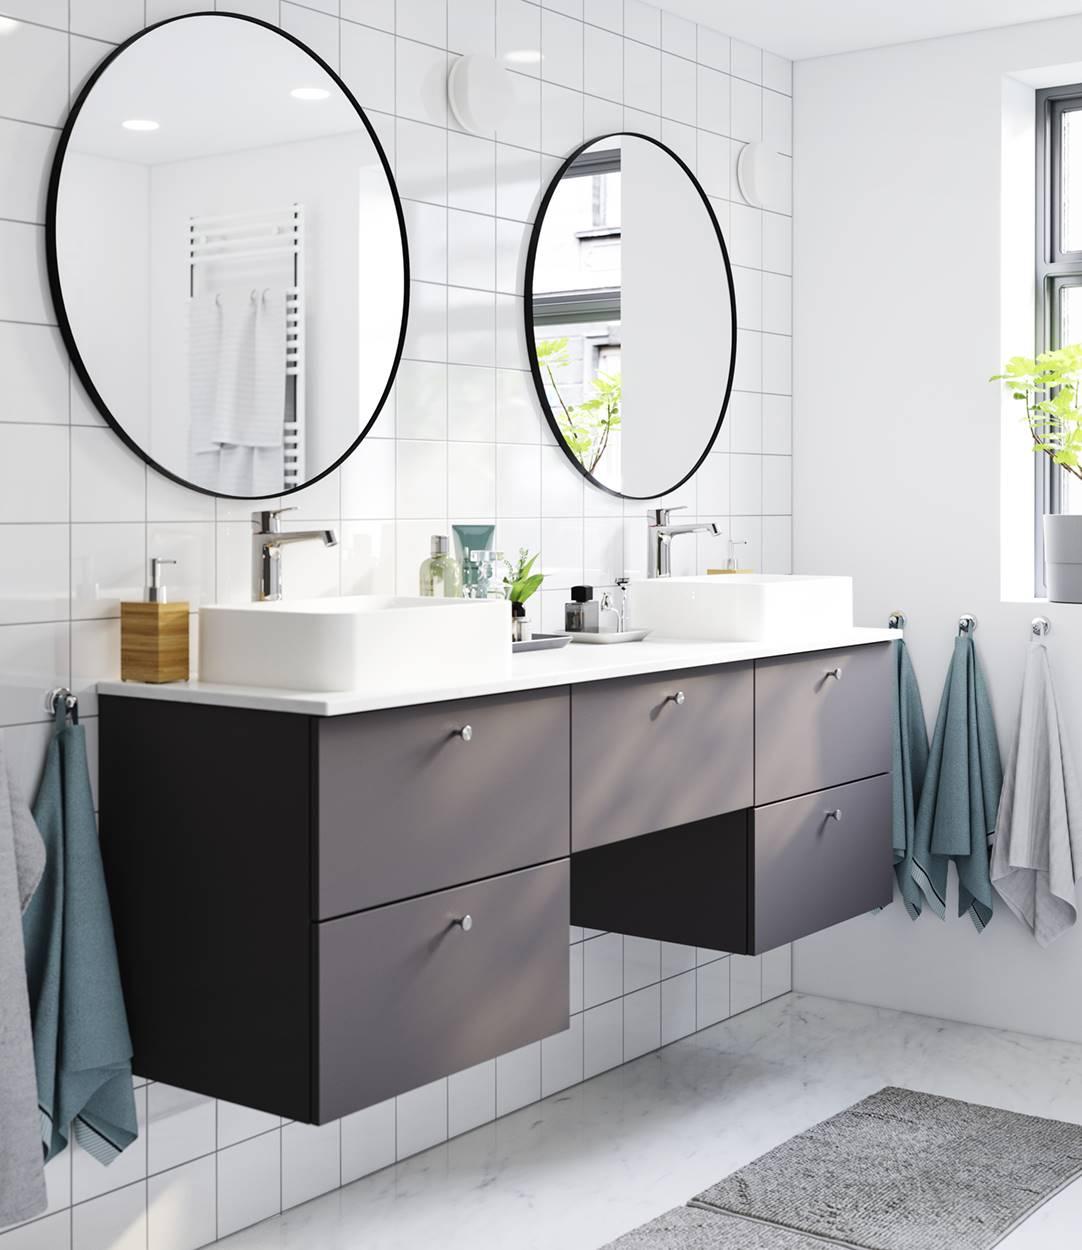 muebles lavabo doble seno ikea